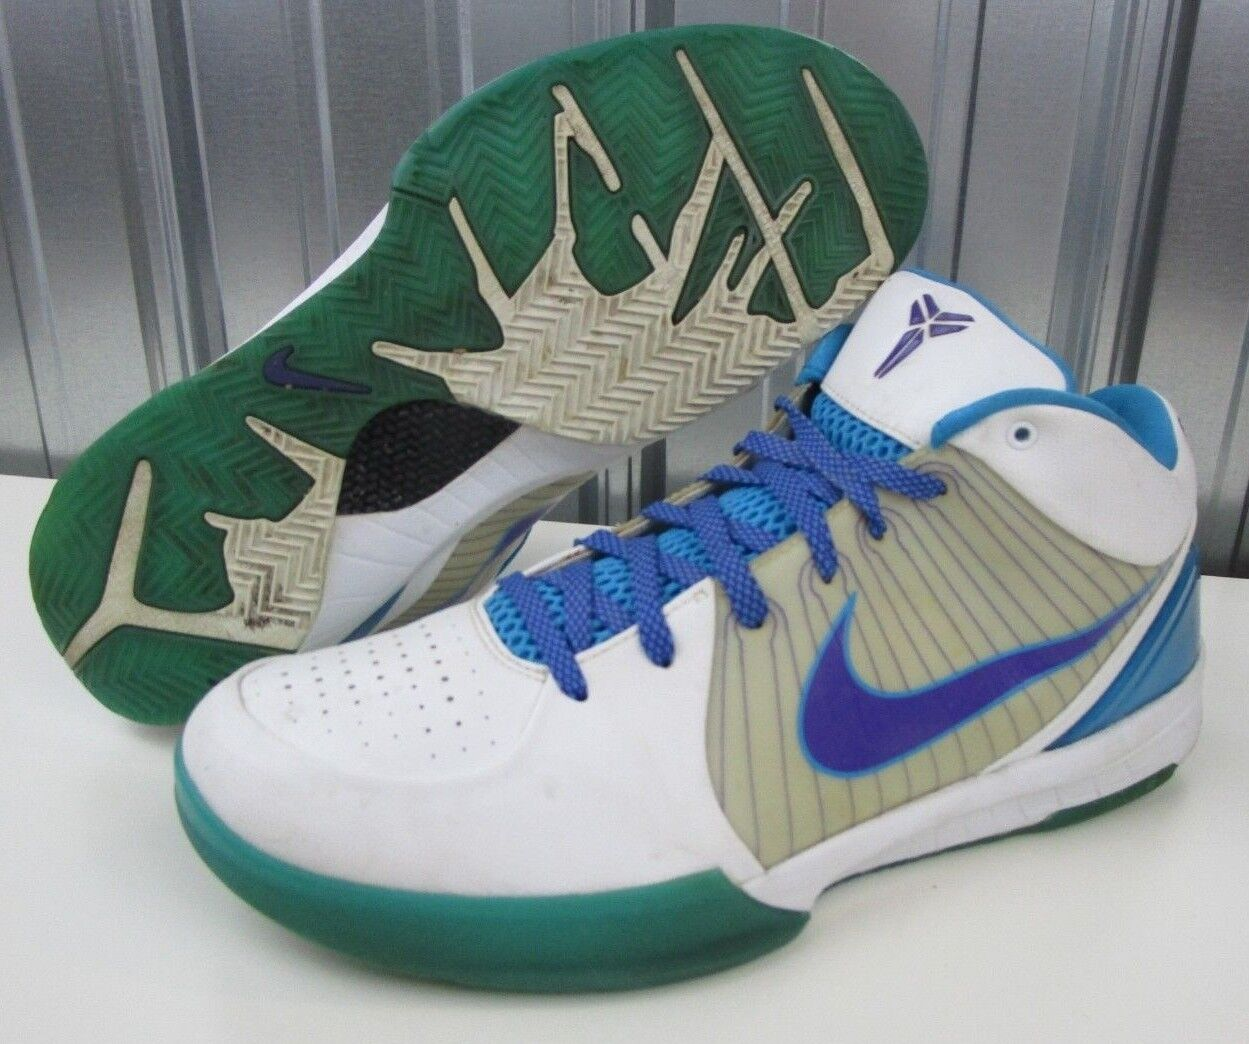 OG 2009 Nike Zoom Kobe Bryant 4 IV IV IV Draft Day White bluee Purple Men's shoes sz 13 87fec2